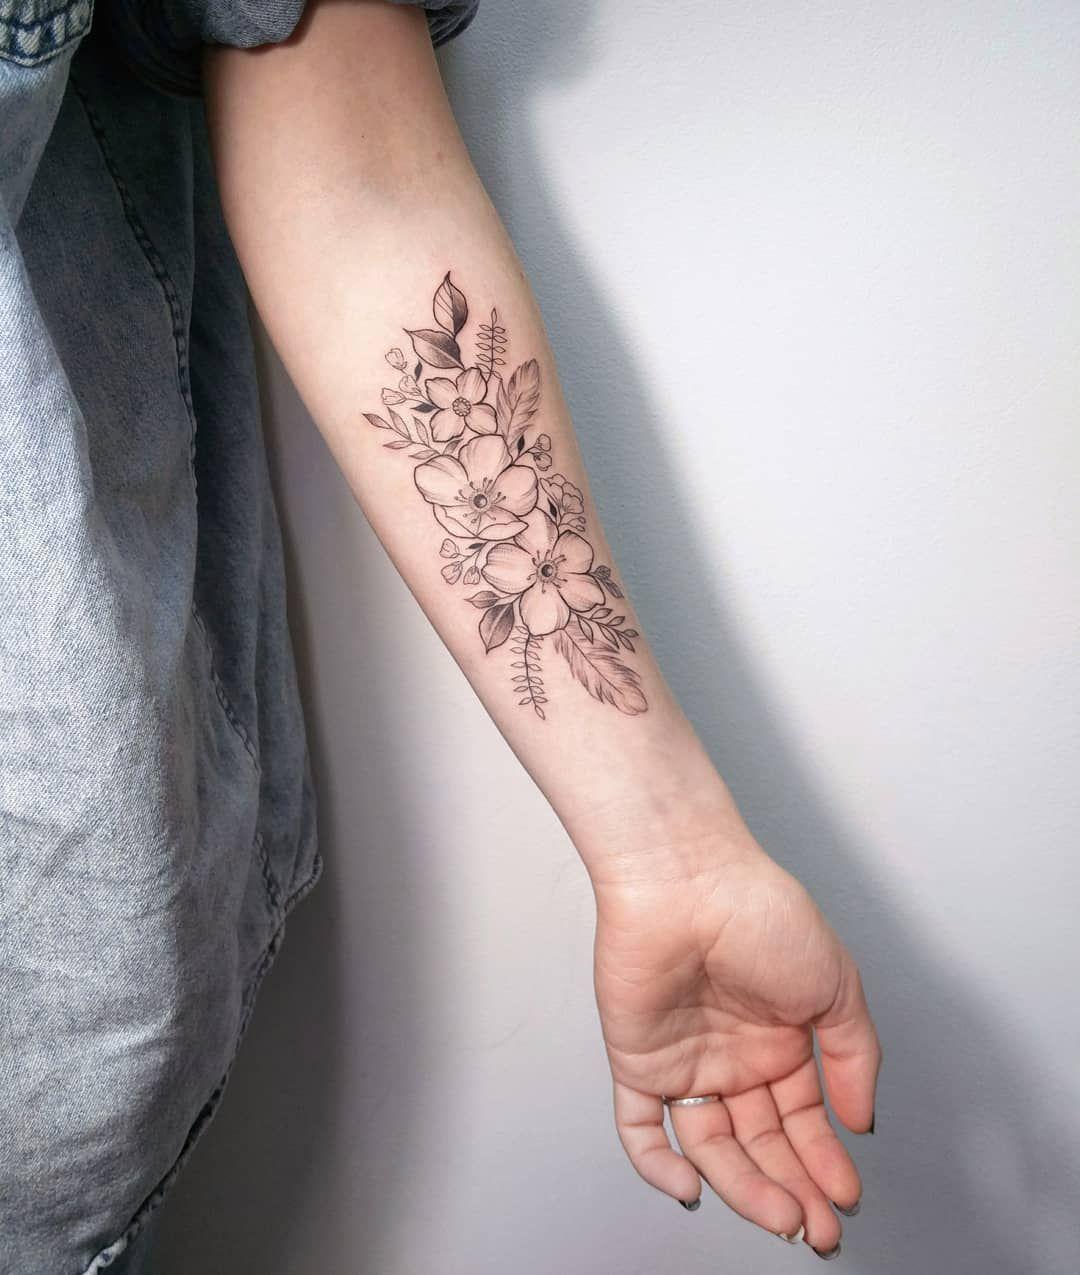 Pin On Tattoos By Irene Bogachuk